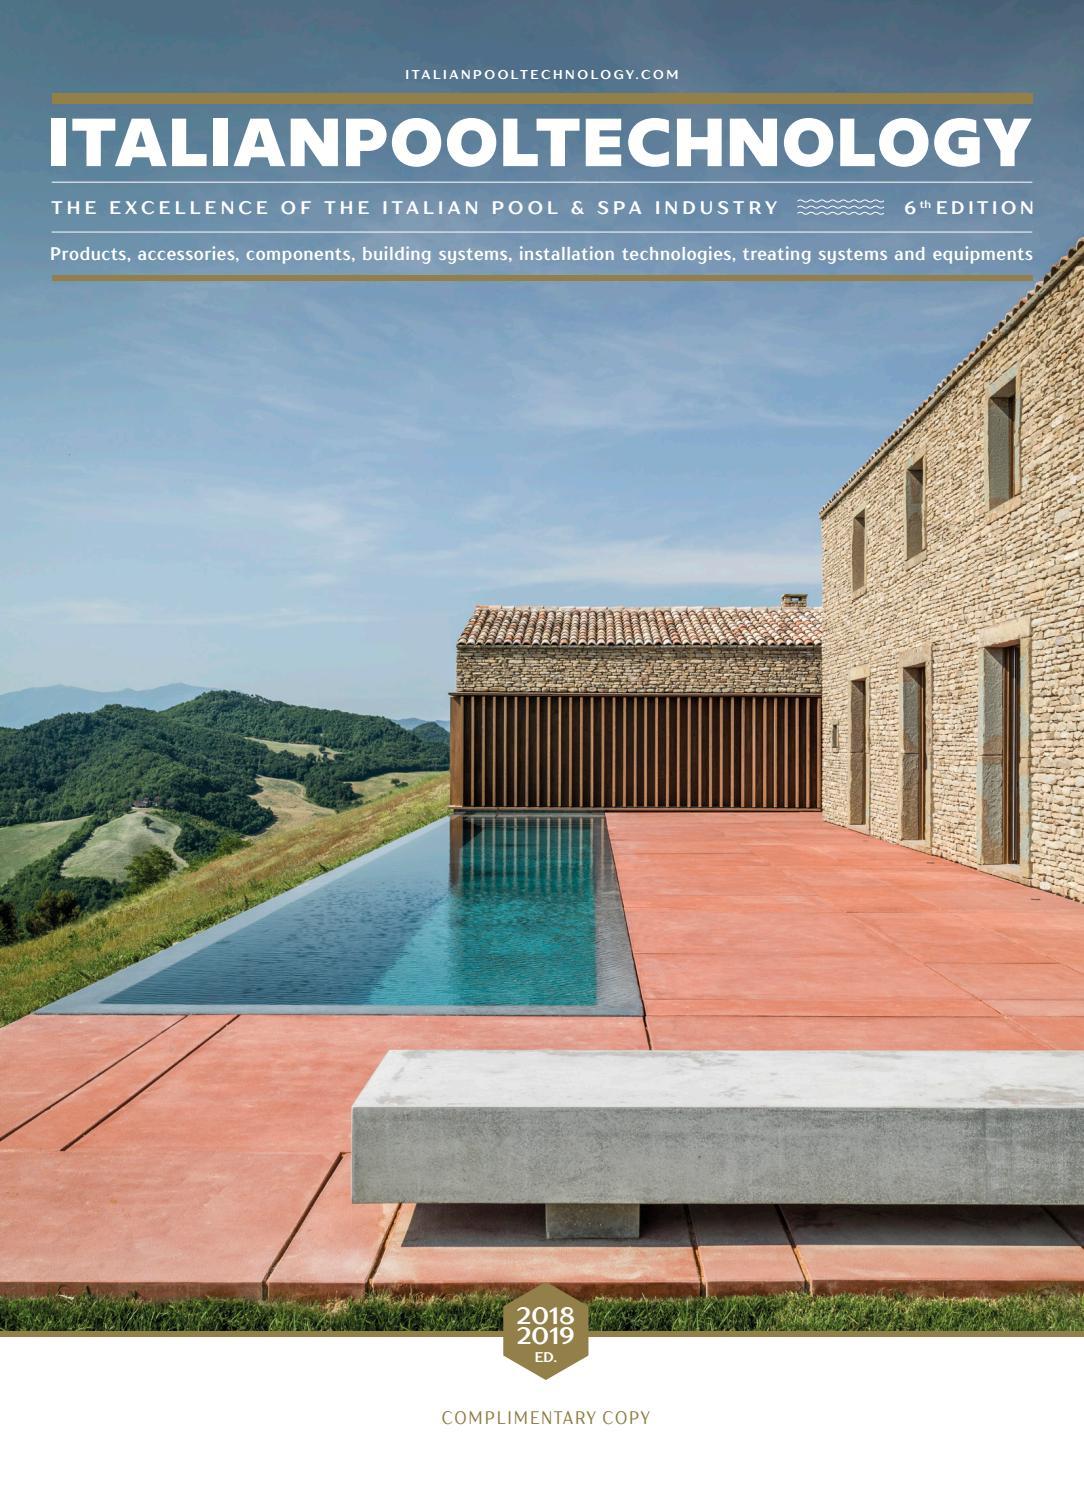 Foto Di Piscine Private italian pool technology 2018 by editrice il campo - issuu